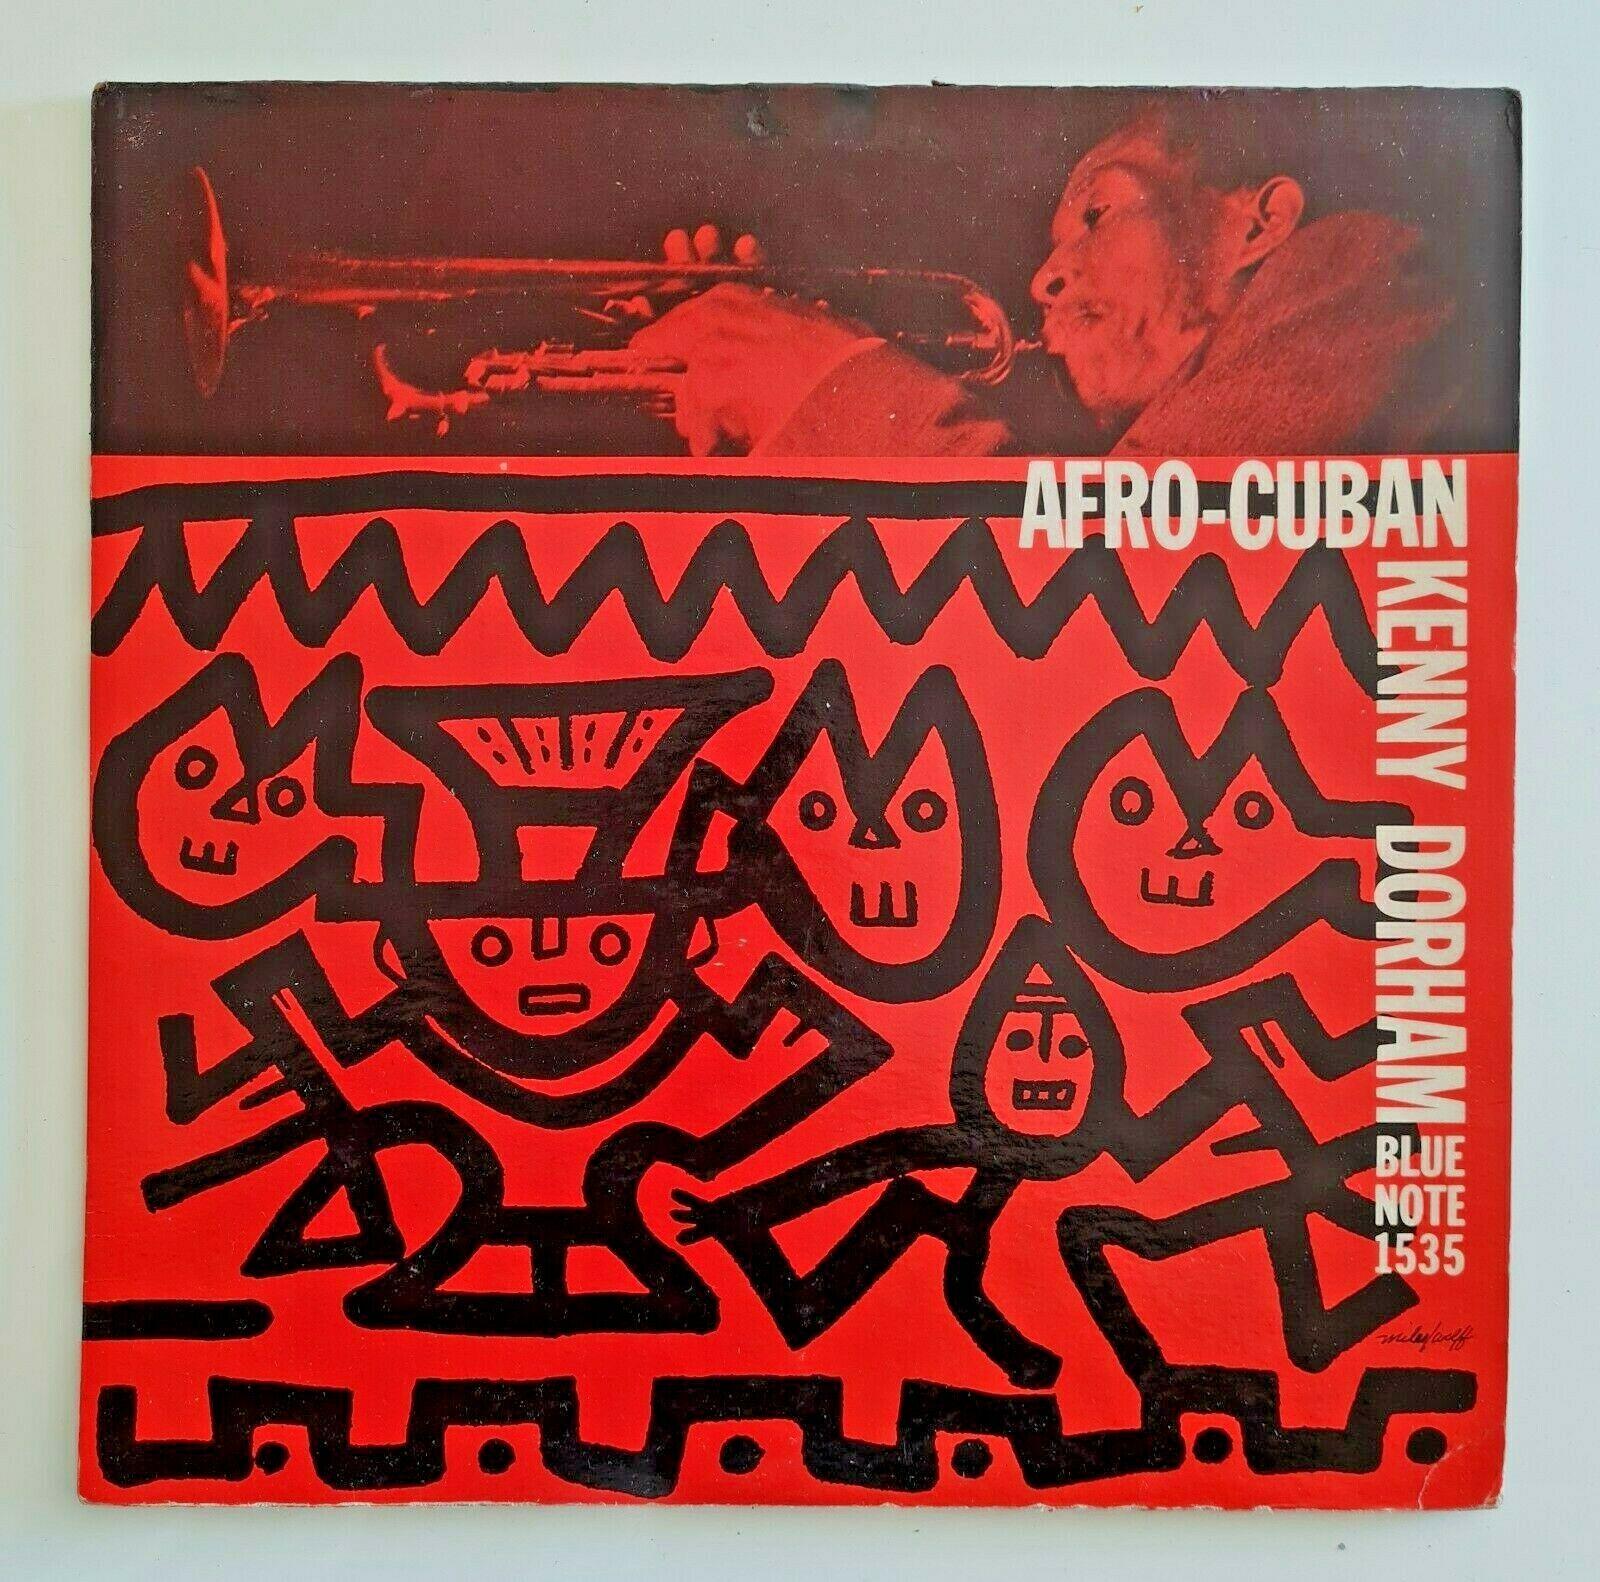 KENNY DORHAM   AFRO CUBAN LP og  BLUE NOTE 1535 RVG MONO  P  EAR DG 1st Press NM